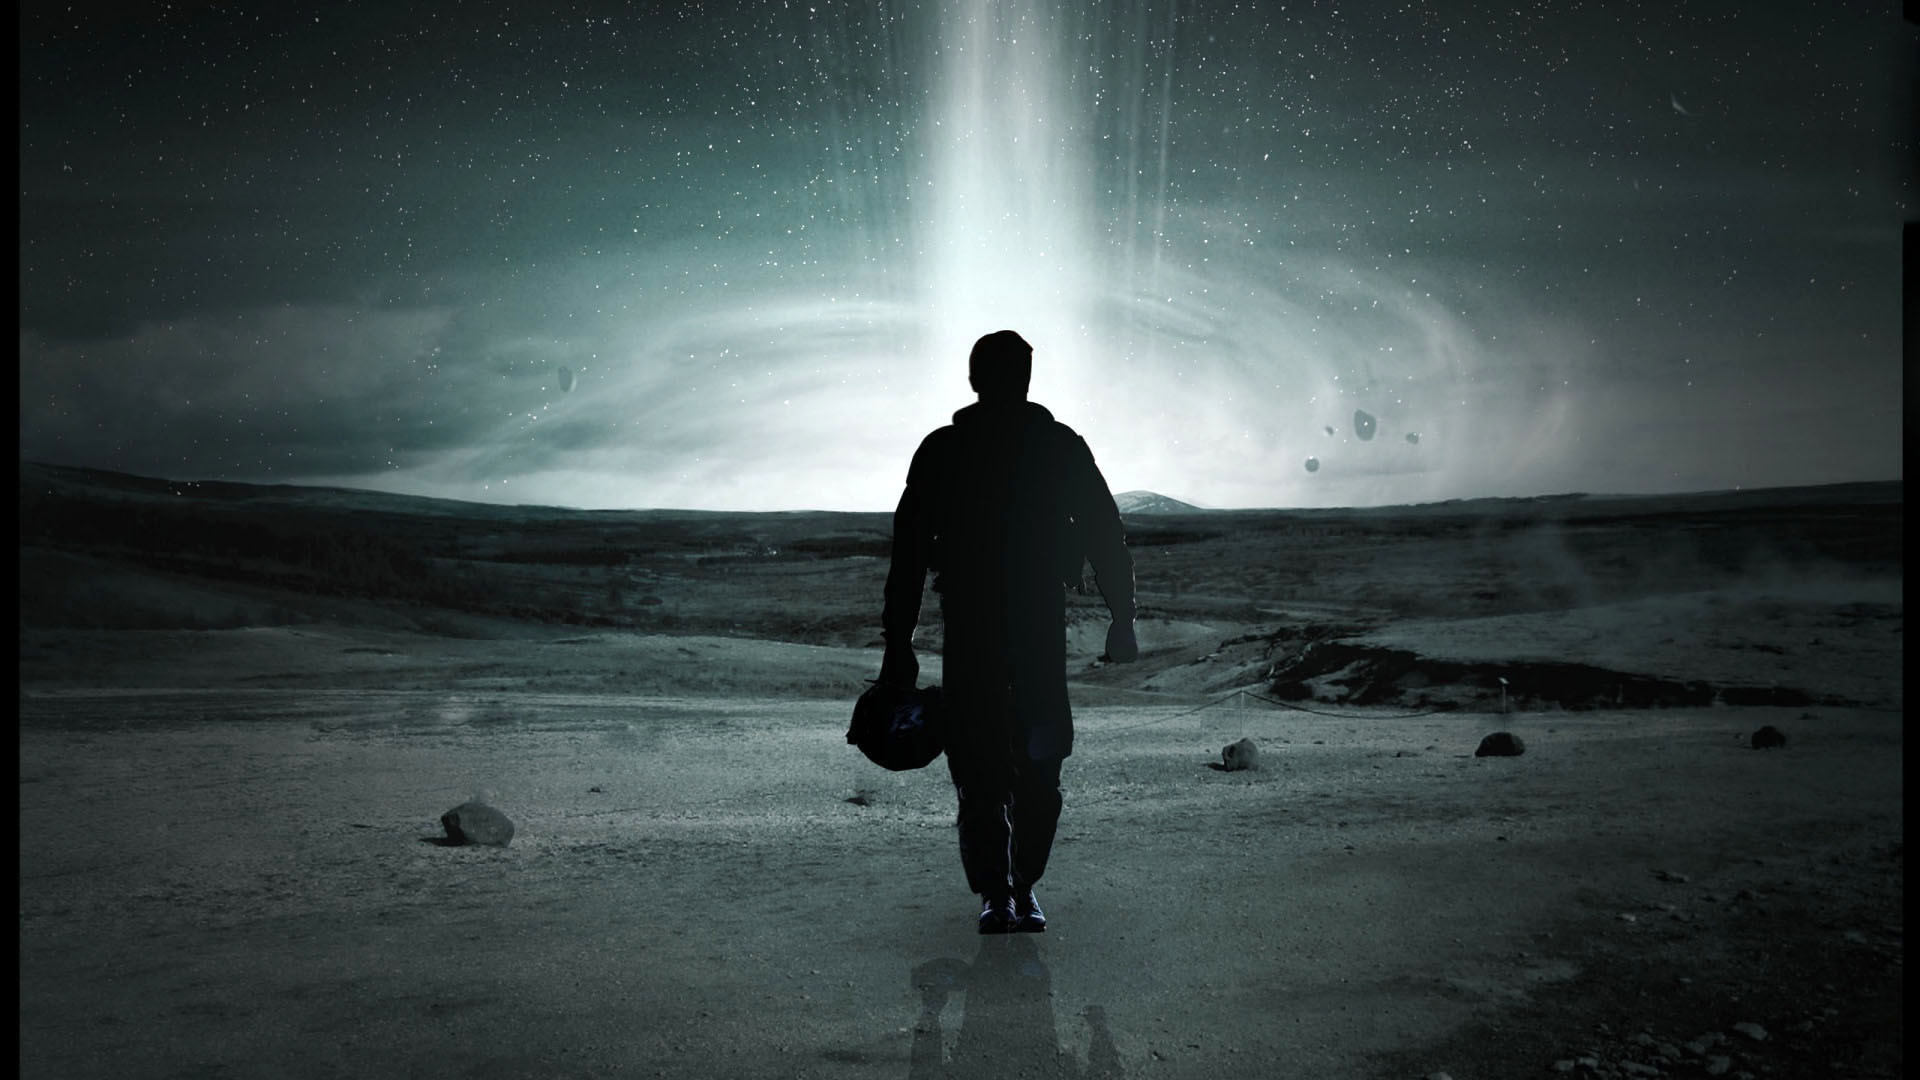 Interstellar Astronaut Silhouette – – Full HD 16/9 .